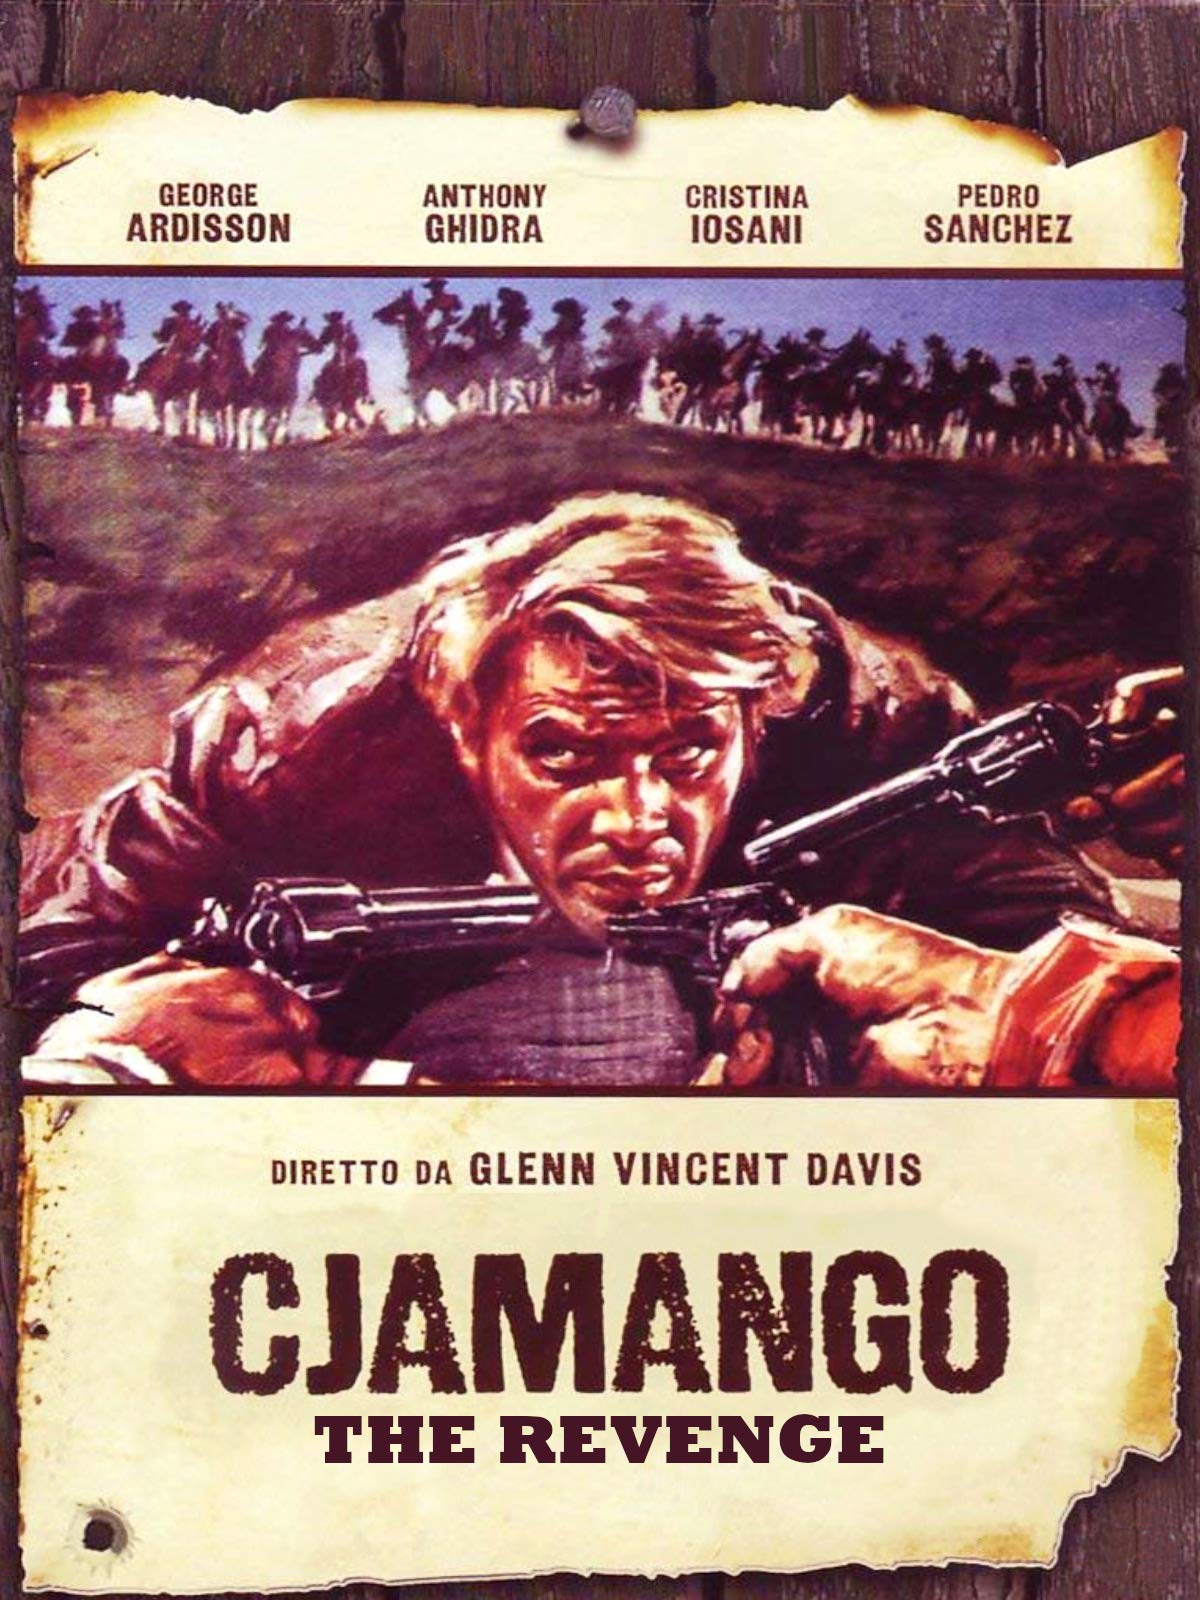 Cjamango The Revenge